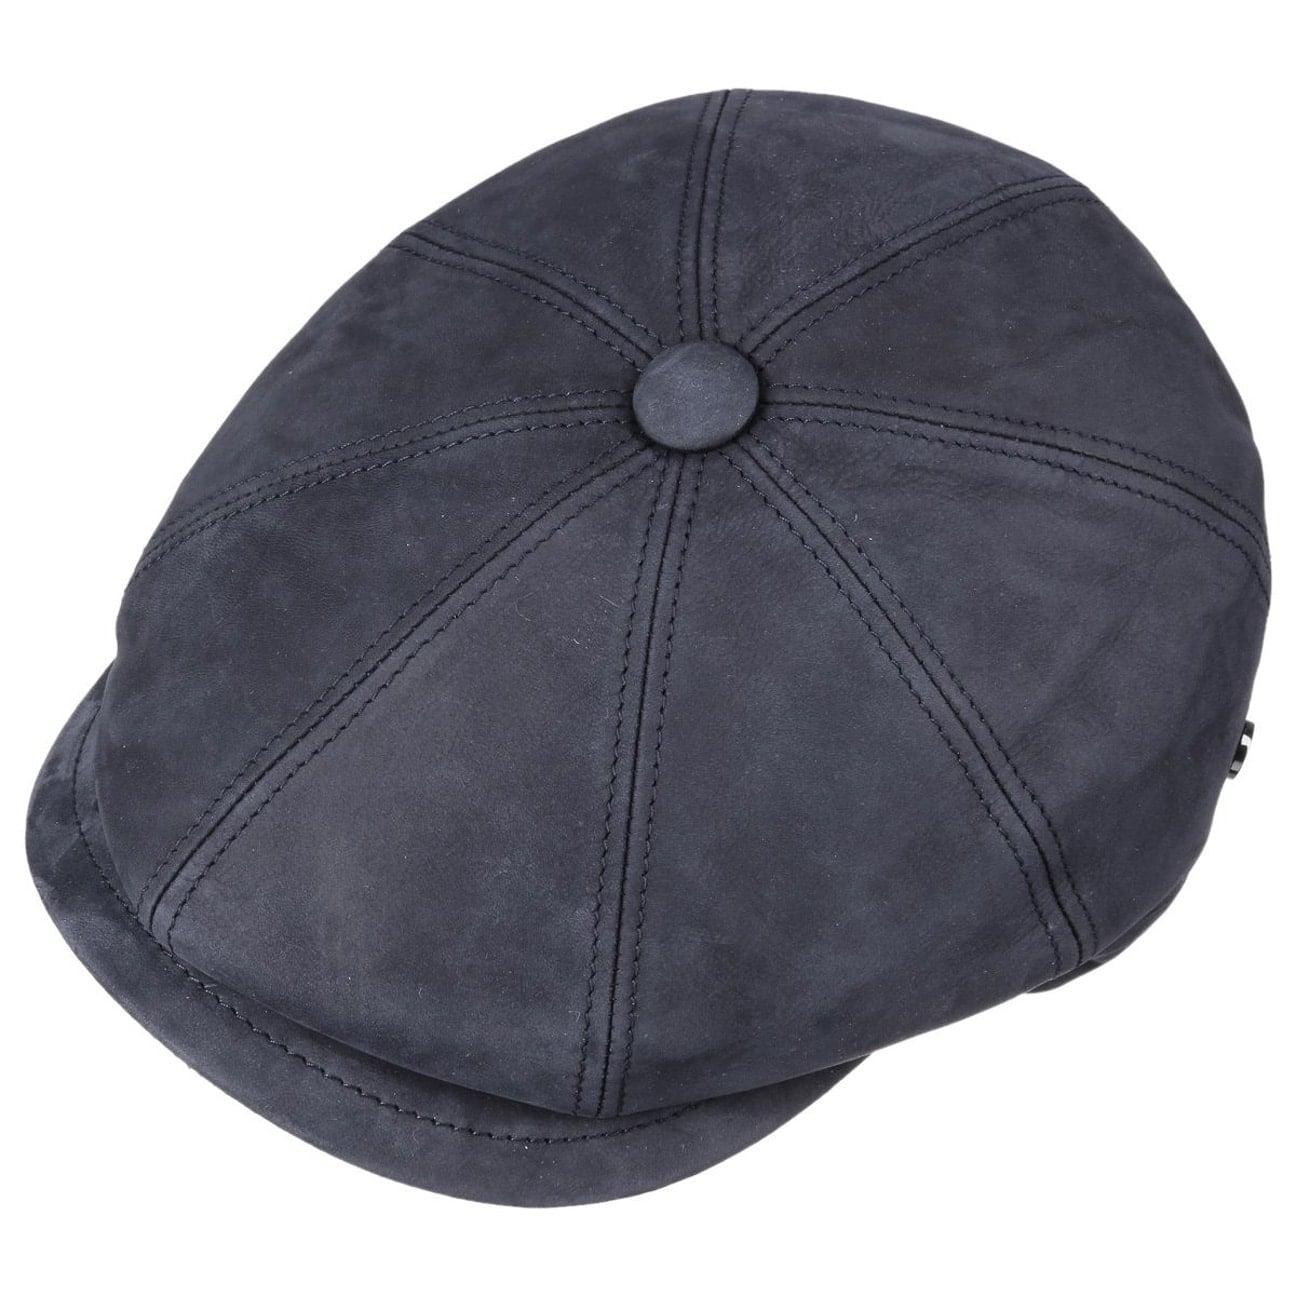 447bf6c5a76f59 ... Nappa Wax Leather Flat Cap by Lierys - blue 2 ...